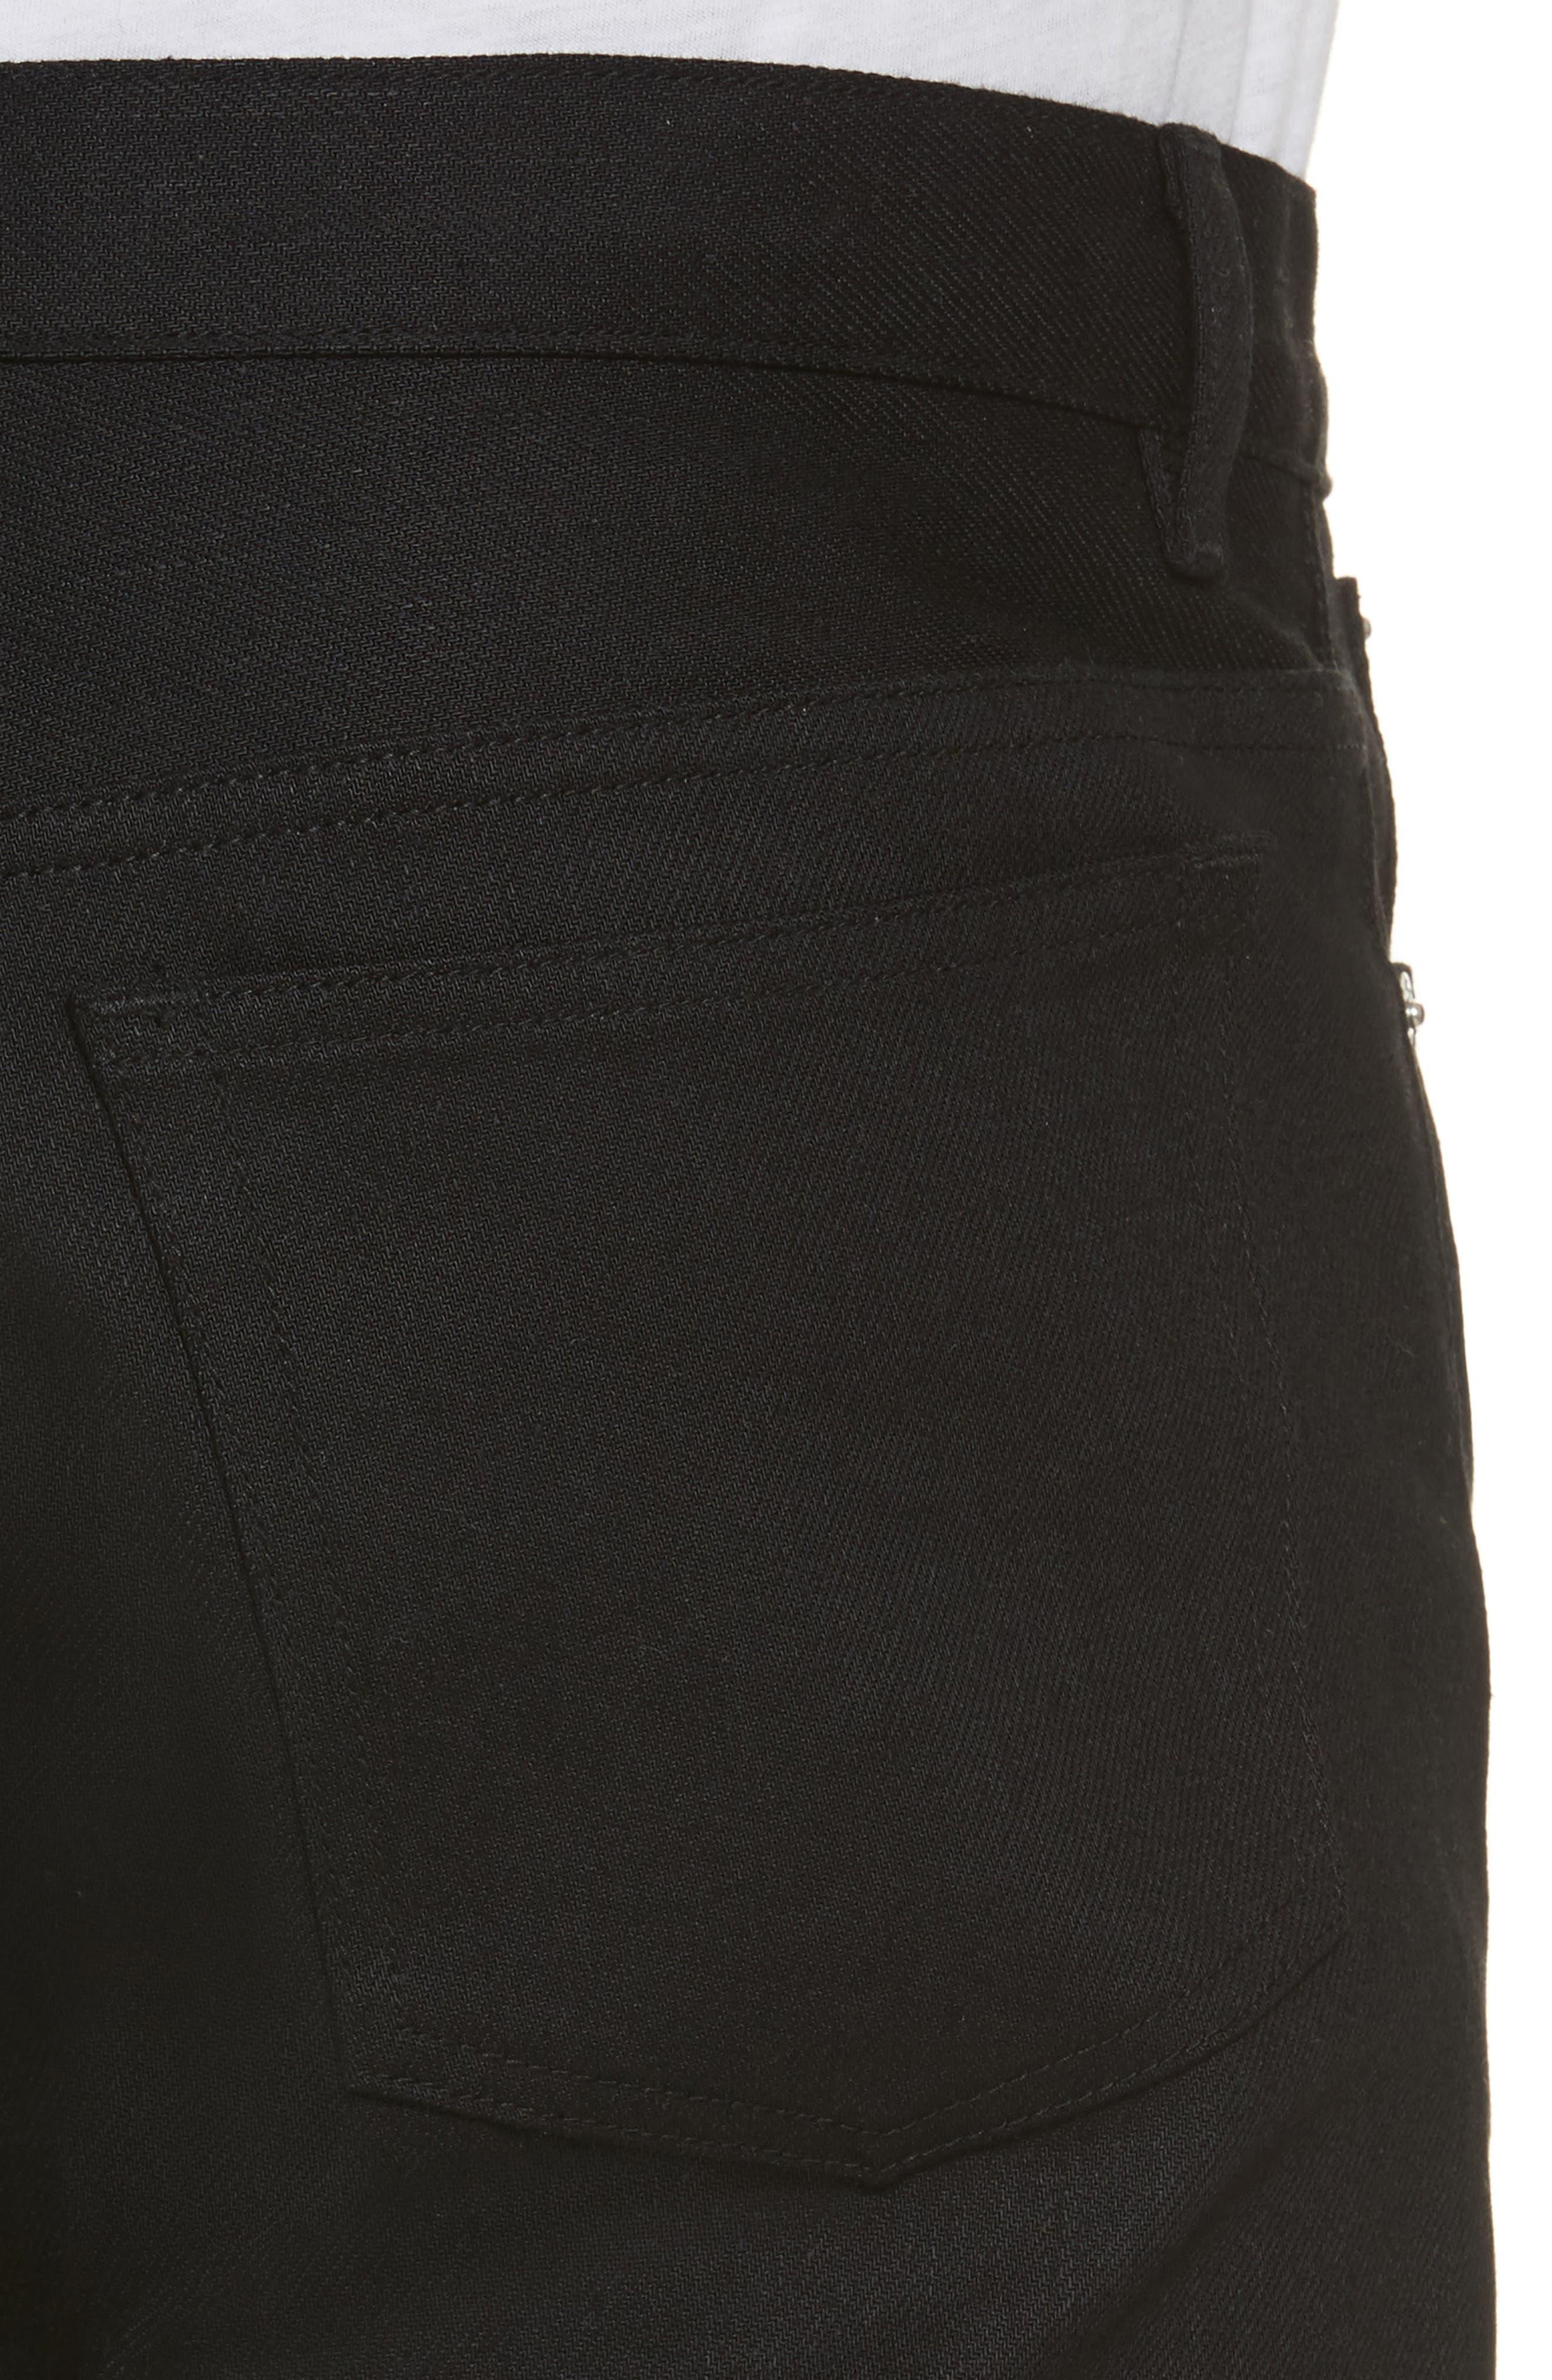 Petit New Standard Stretch Skinny Fit Jeans,                             Alternate thumbnail 4, color,                             BLACK